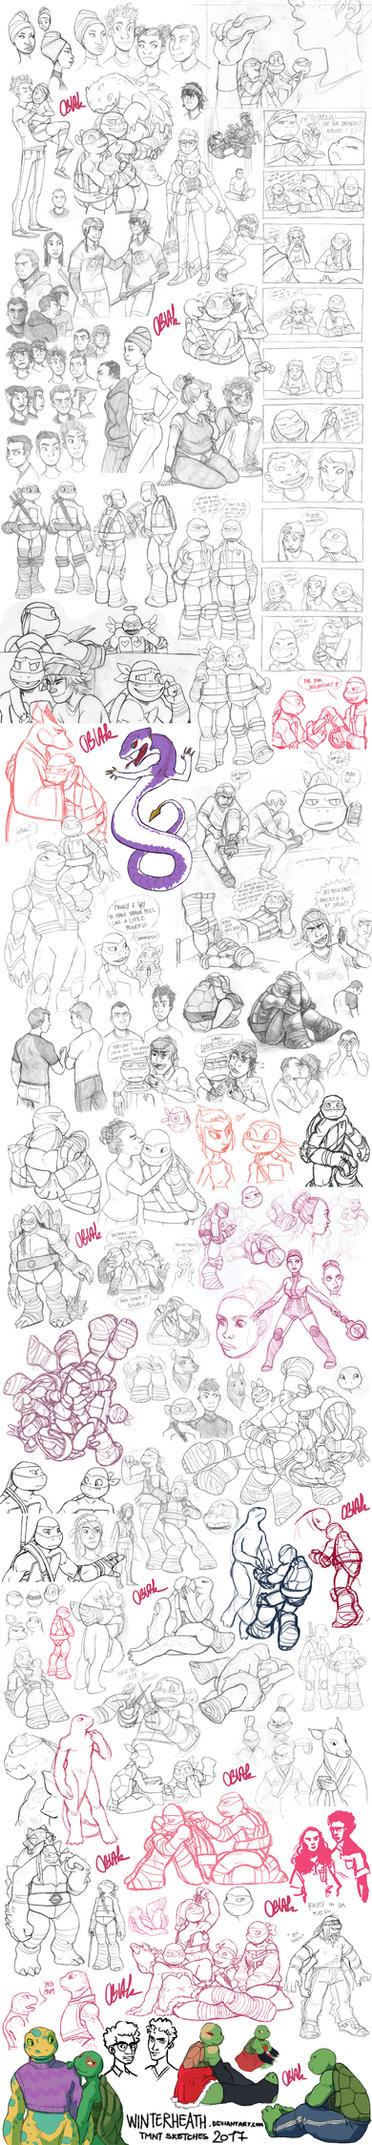 TMNT Sketch Dump 2017 by WinterHeath